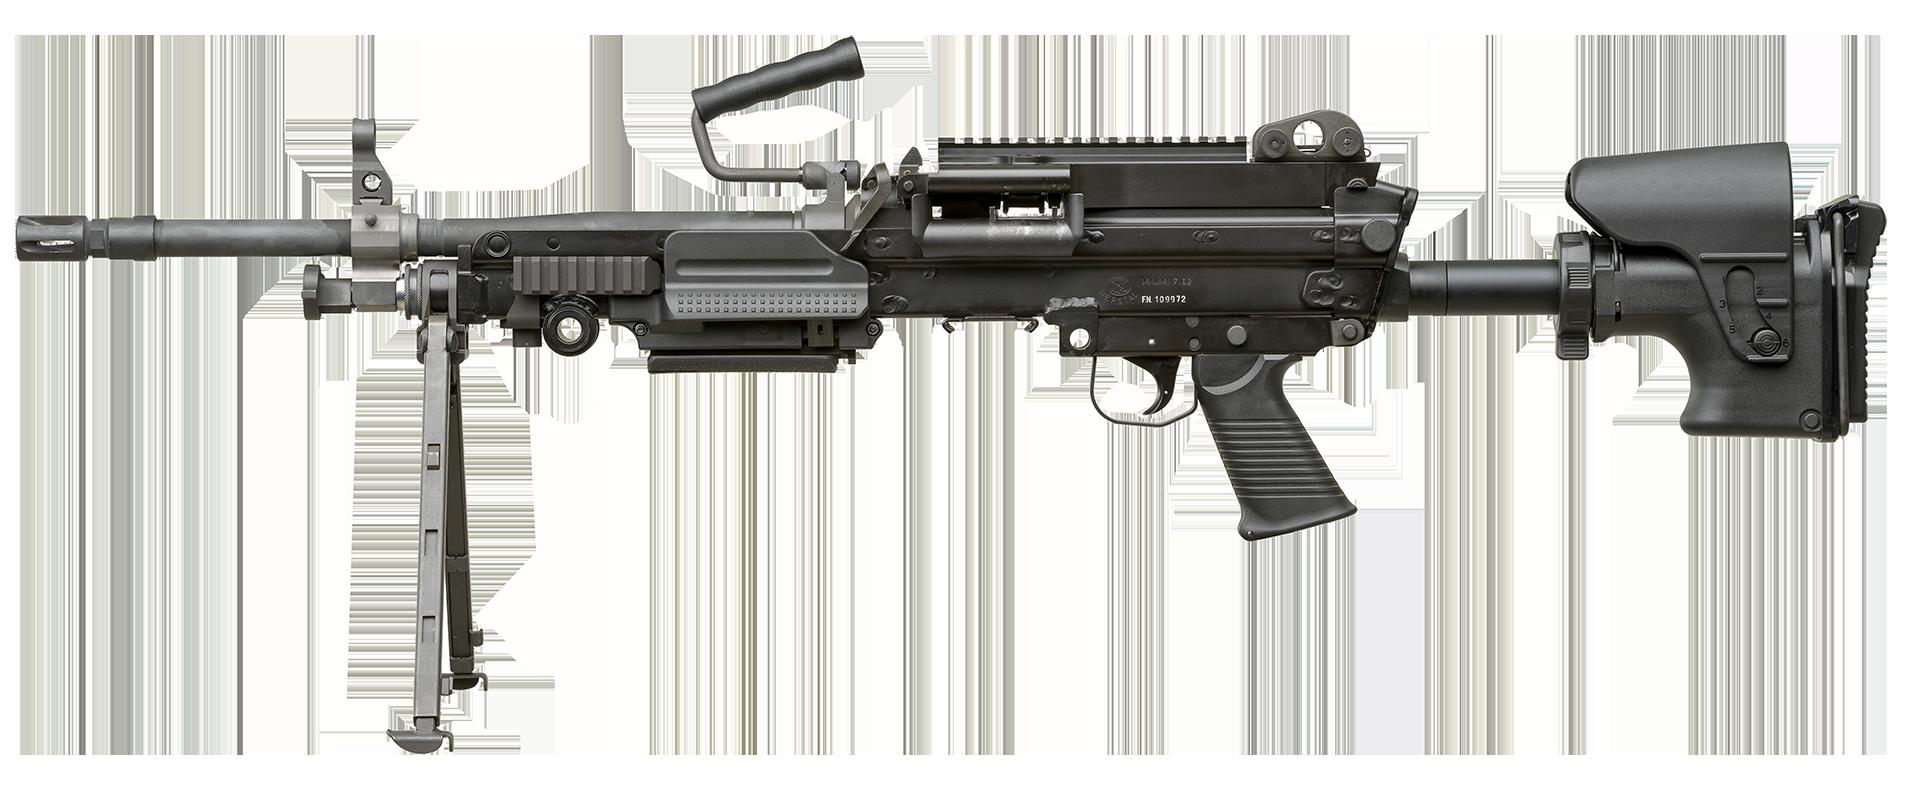 FN MINIMI® 7.62 Mk3